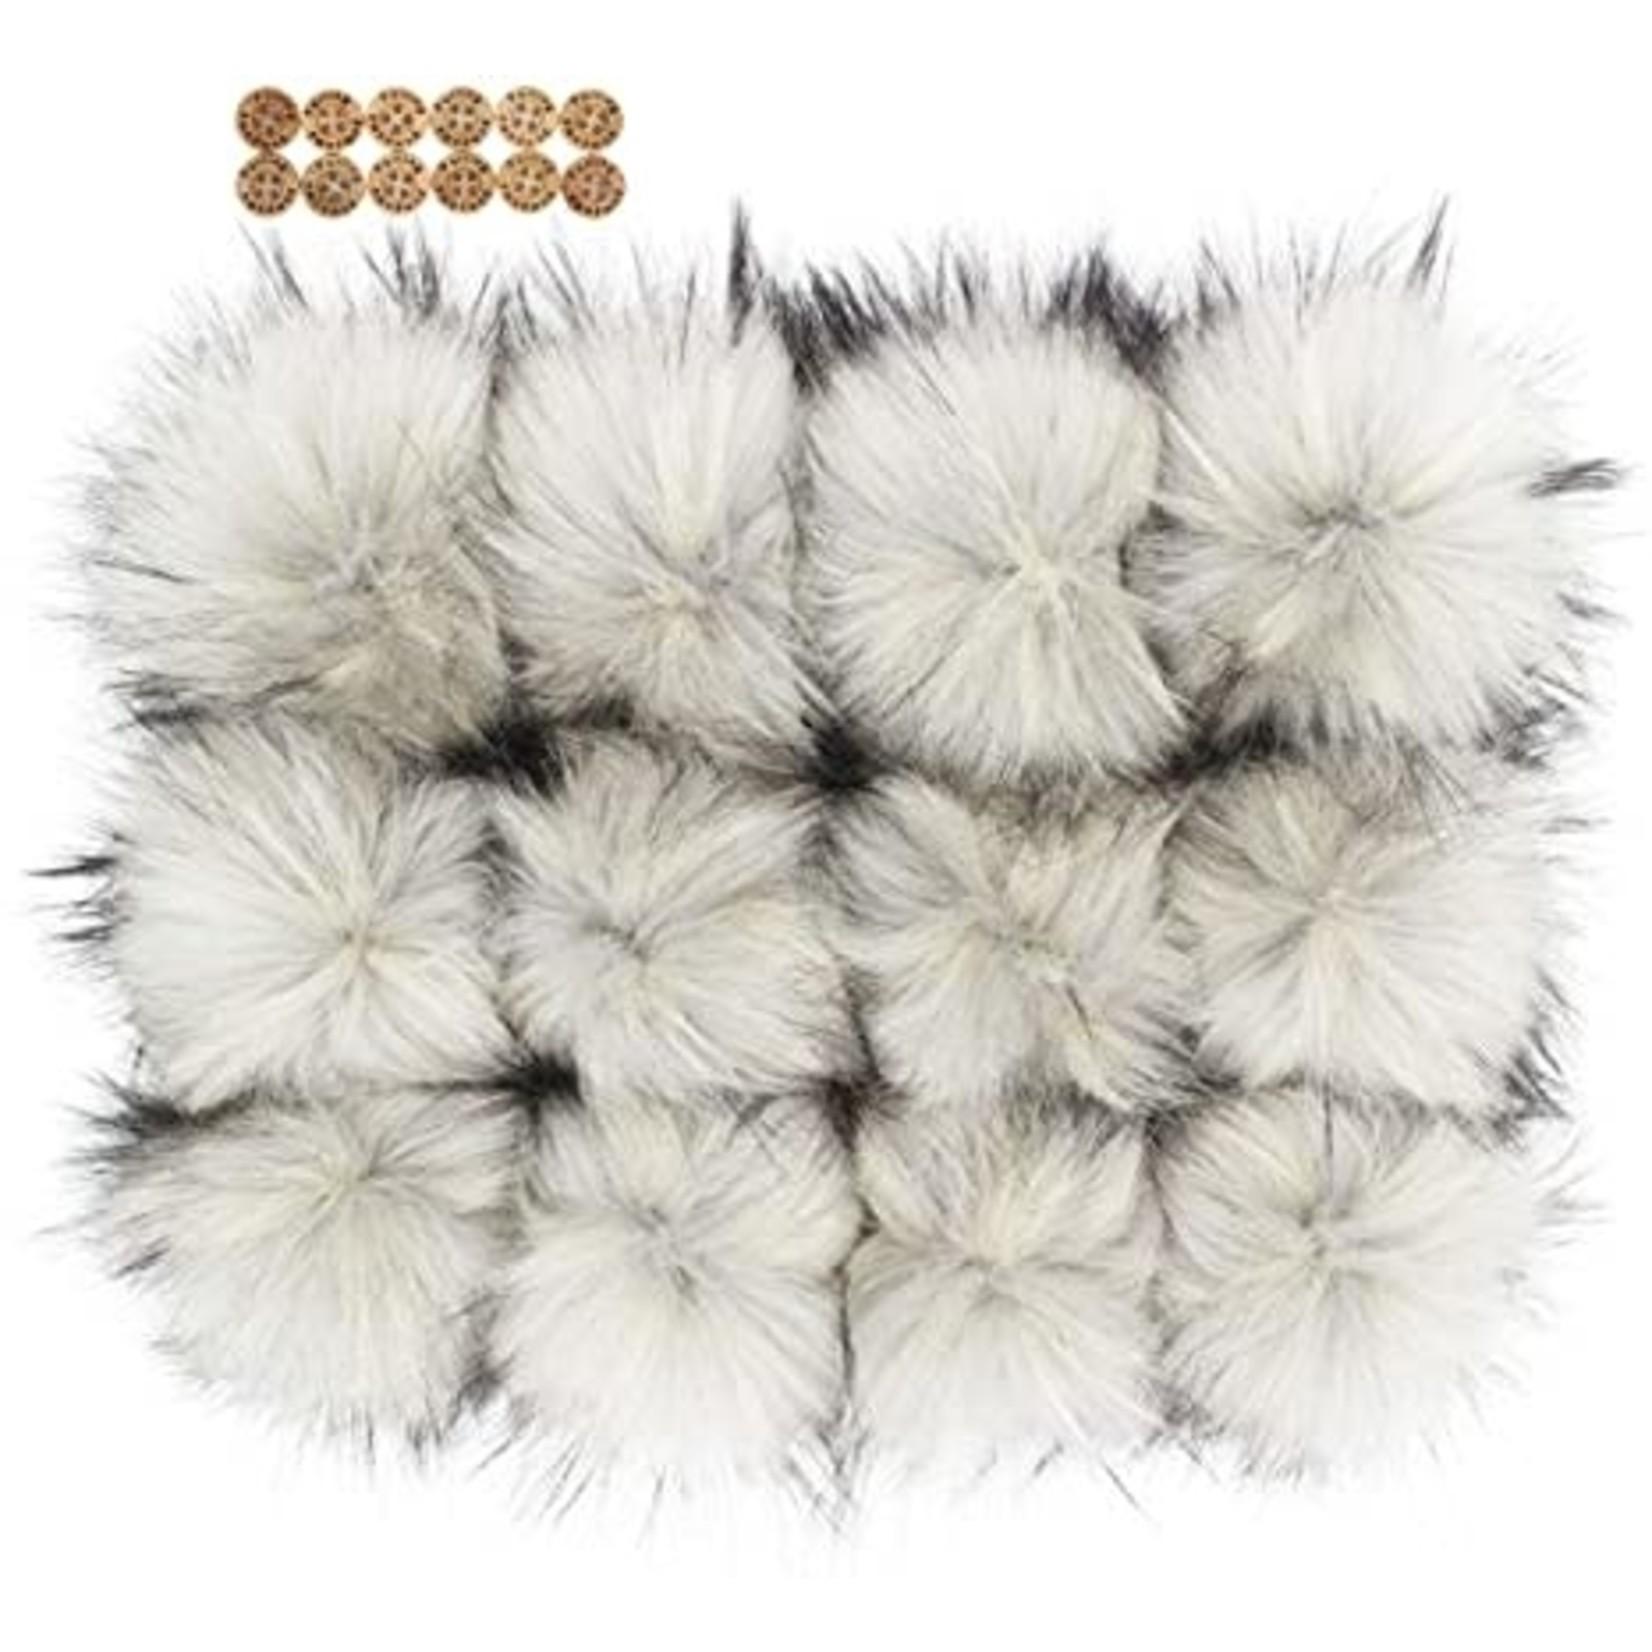 Wool Trends Fur Pom-Poms (Snap-On)